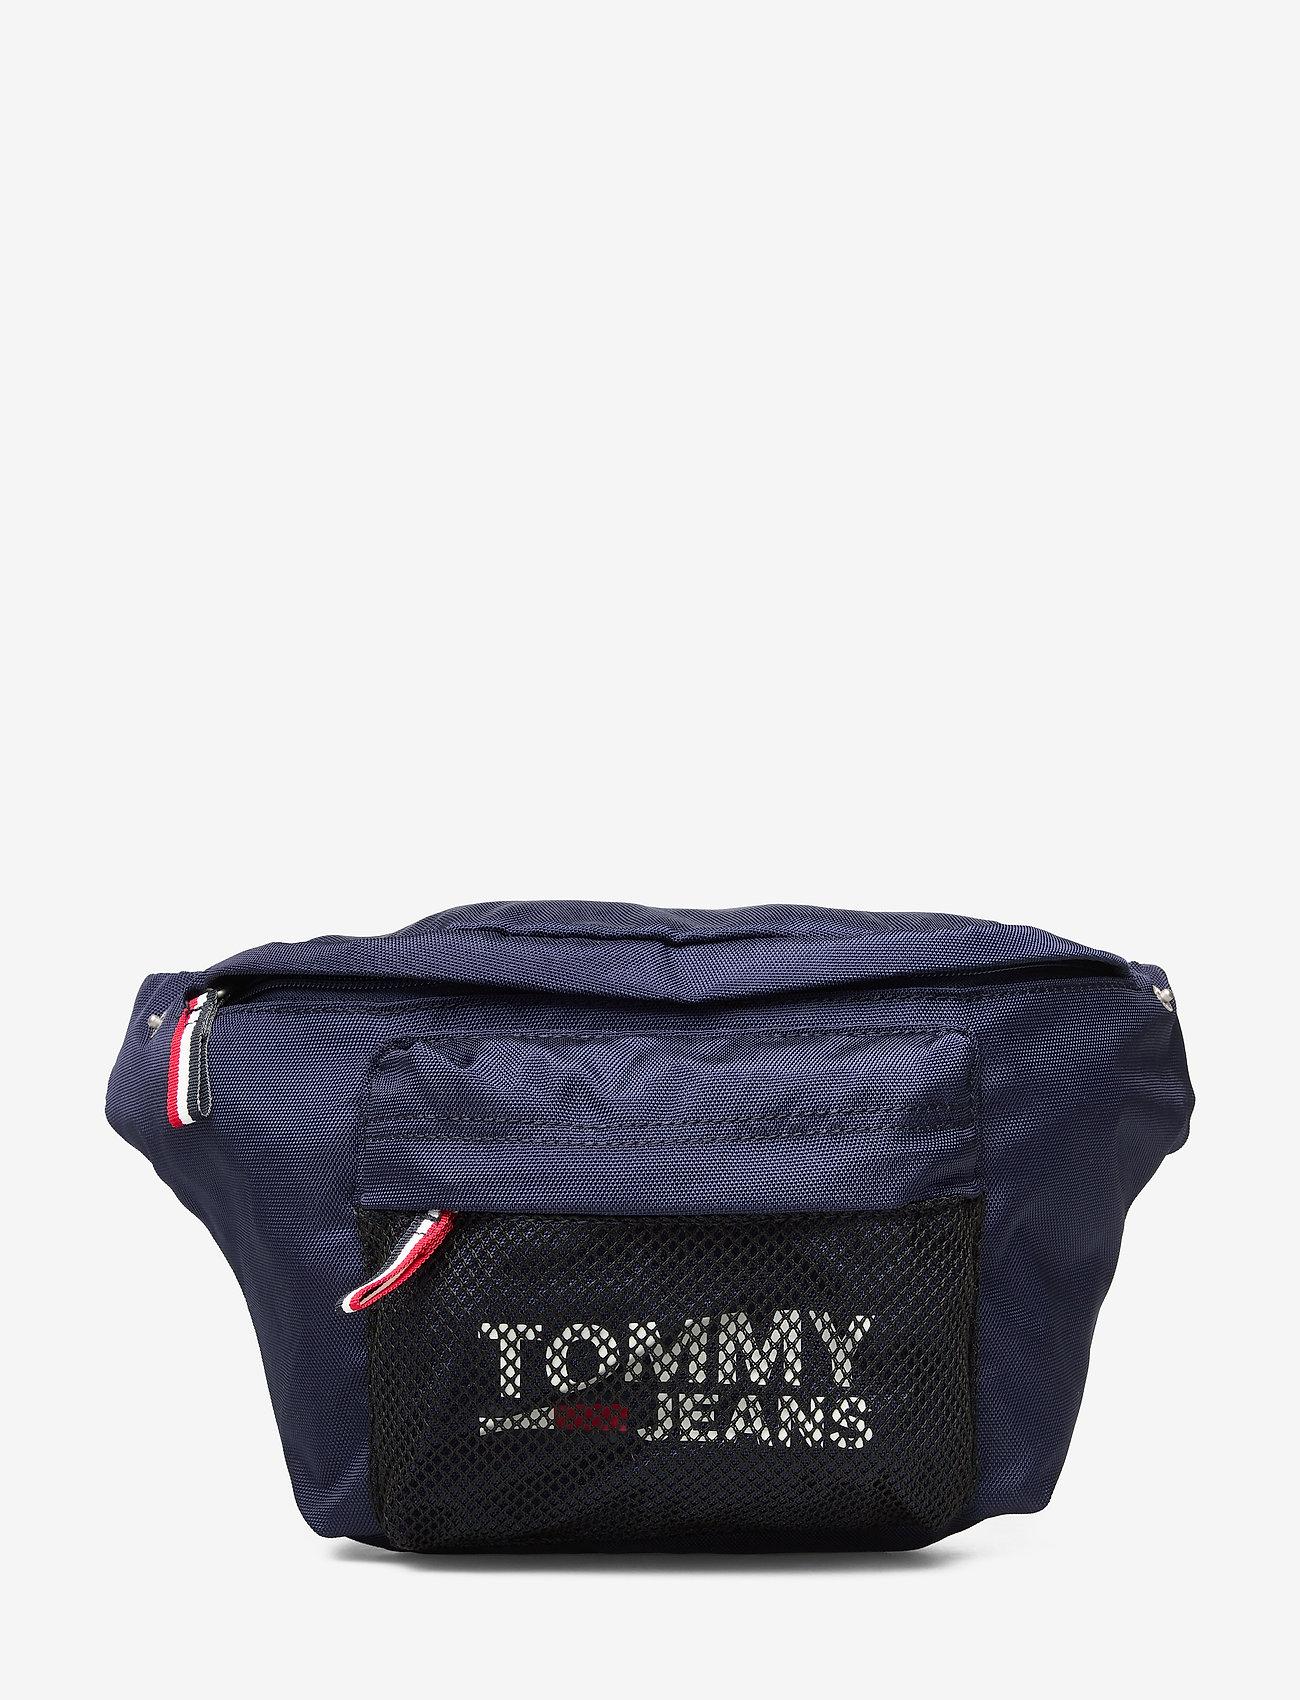 Tommy Hilfiger TJM Cool City Pencilcase Black Iris